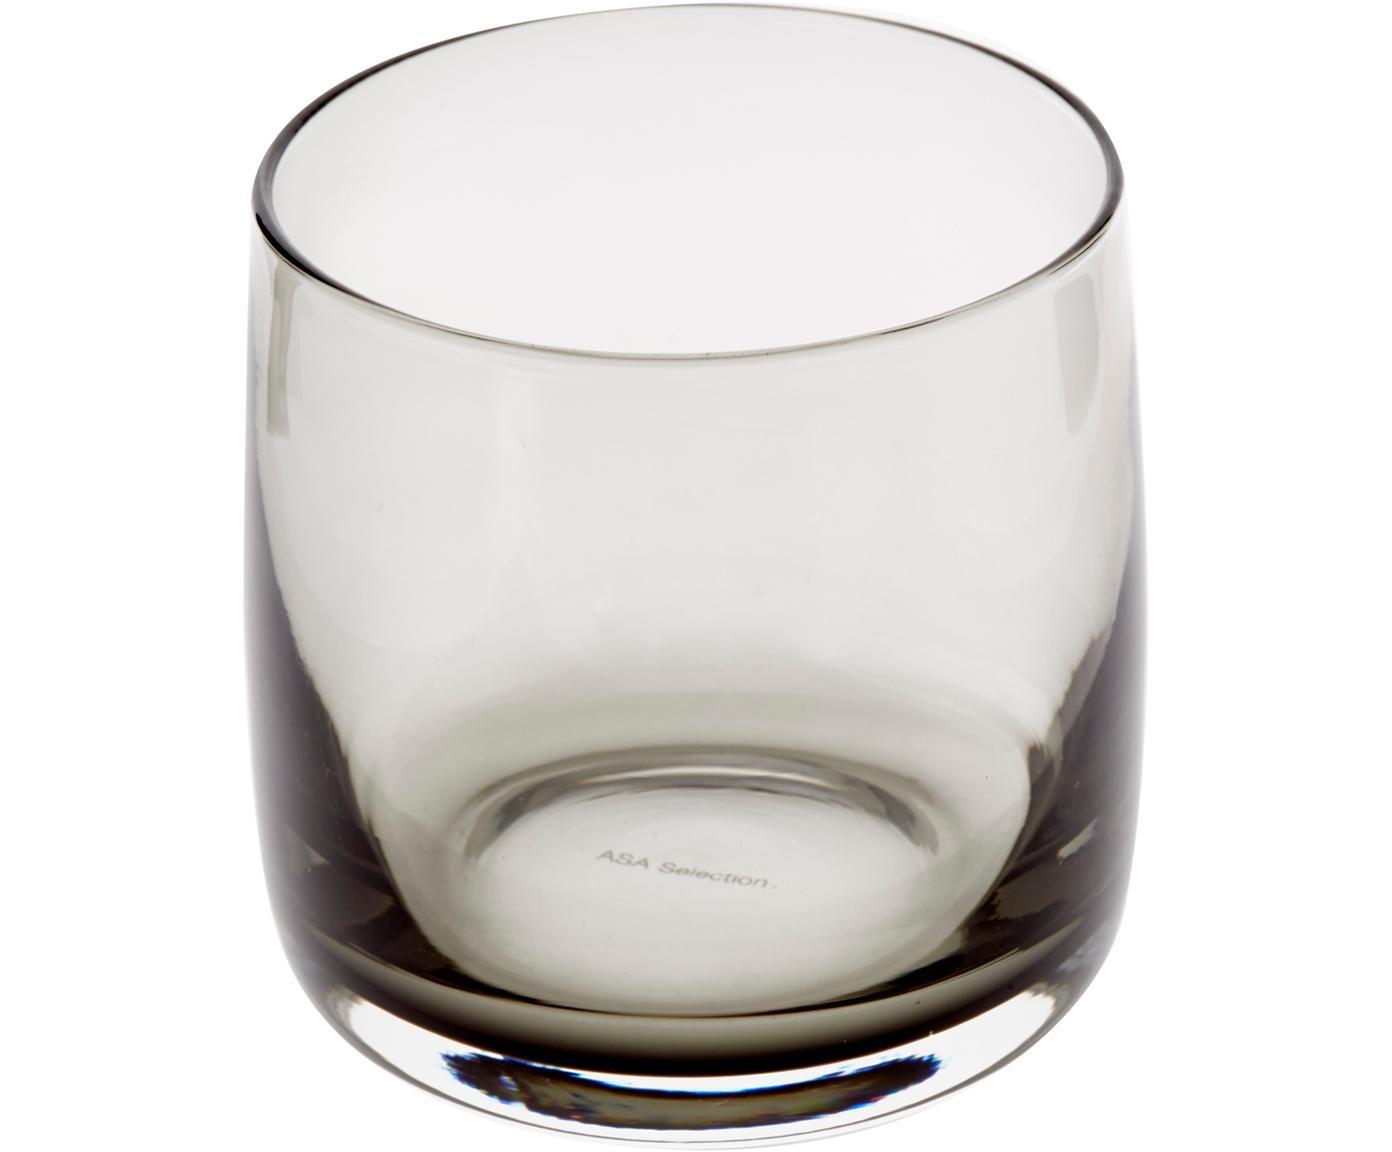 Vasos artesanales Colored, 6uds., Vidrio, Gris, transparente, Ø 8x Al 8 cm